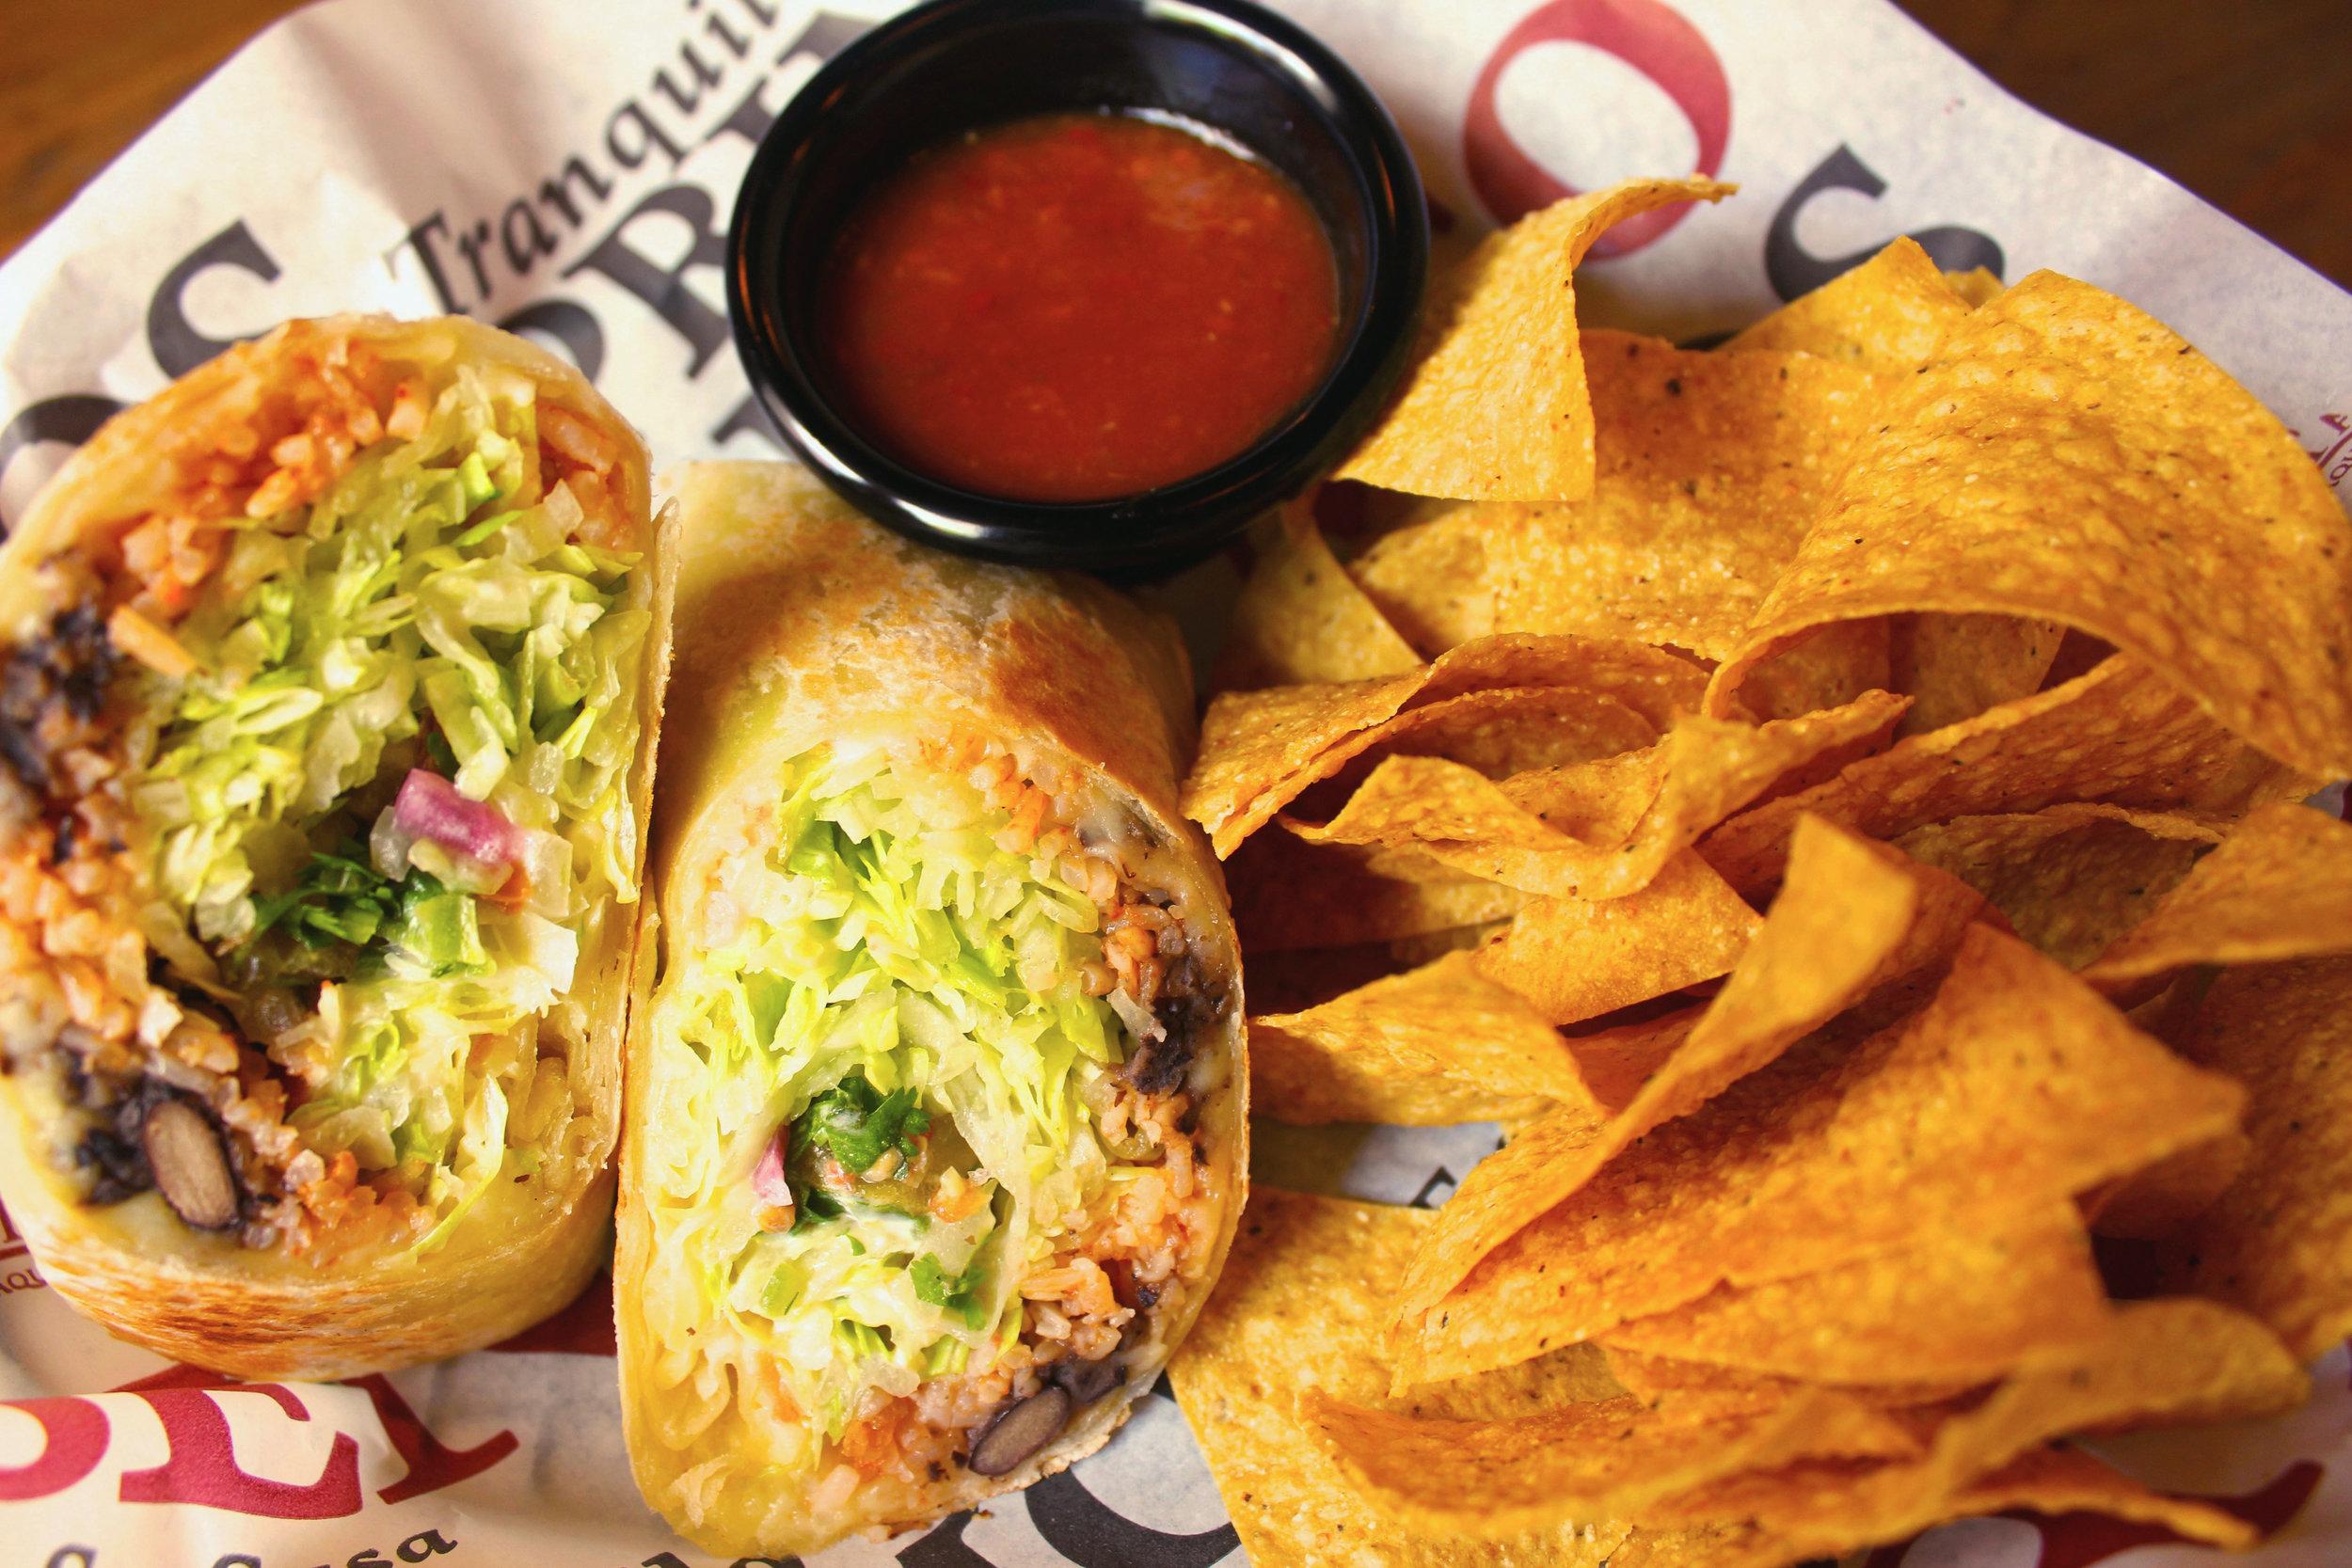 CQ_Senor-Taco_Burrito.JPG